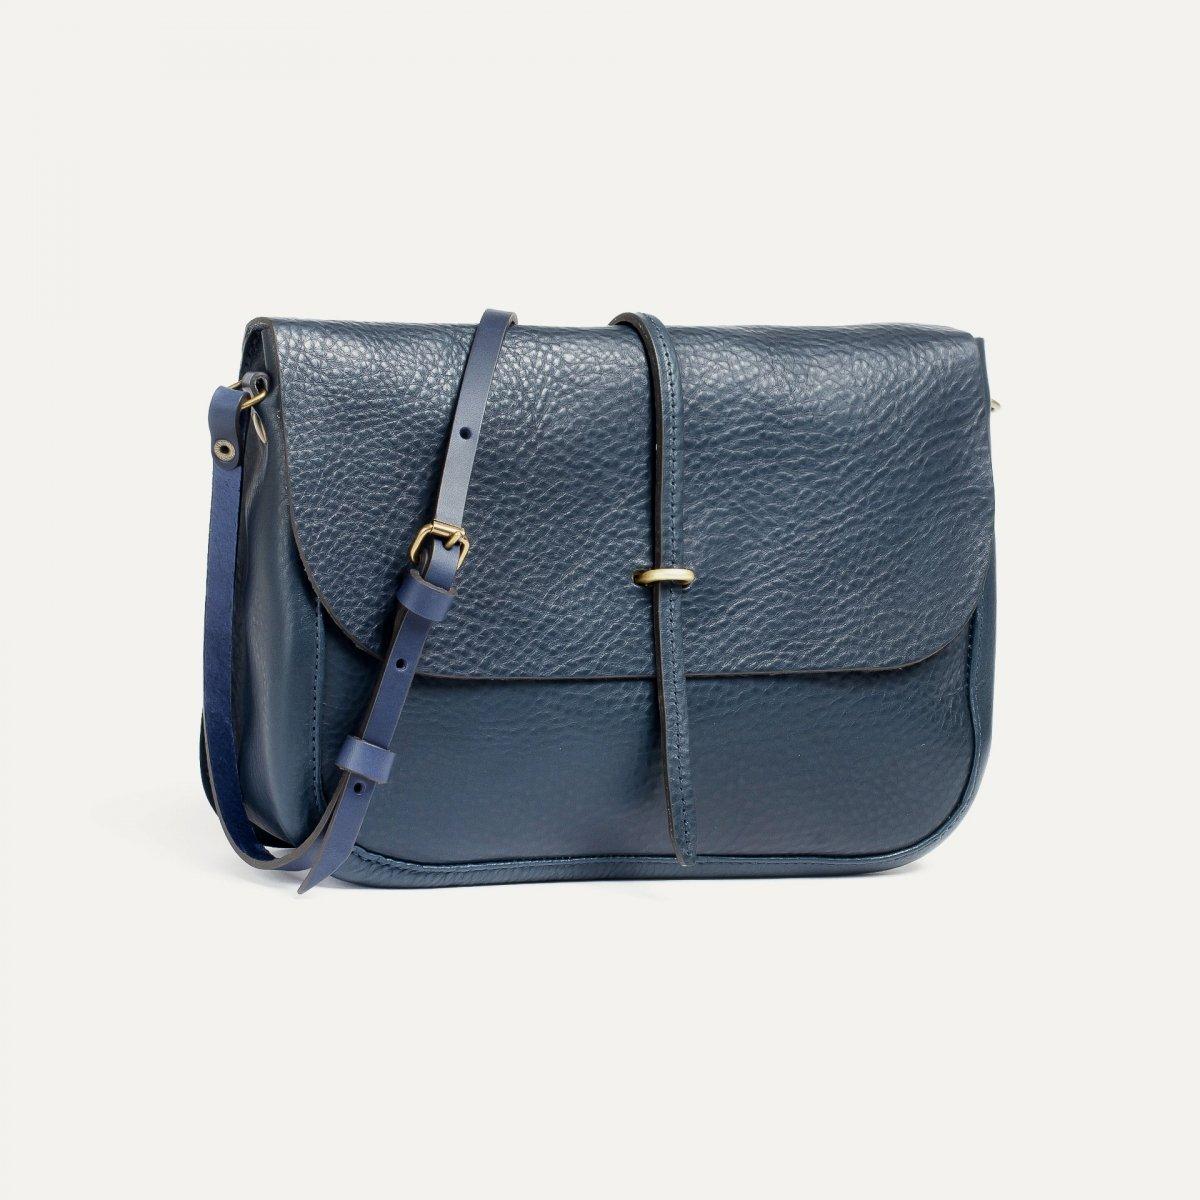 Pastel handbag - Navy Blue (image n°2)